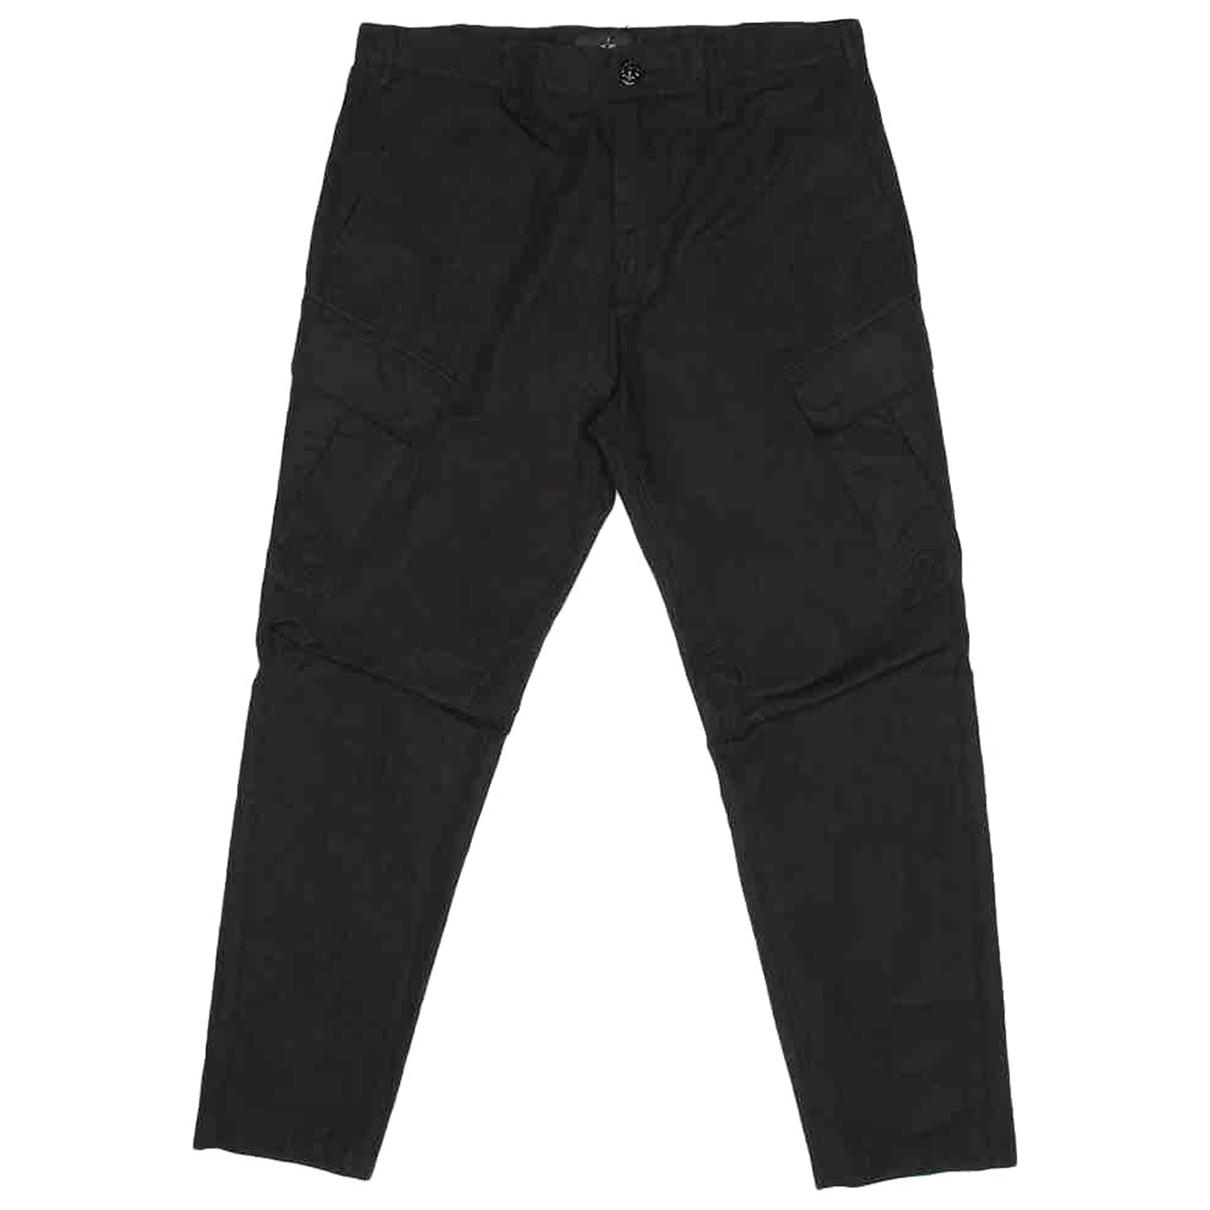 Stone Island \N Black Cotton Trousers for Men 46 IT